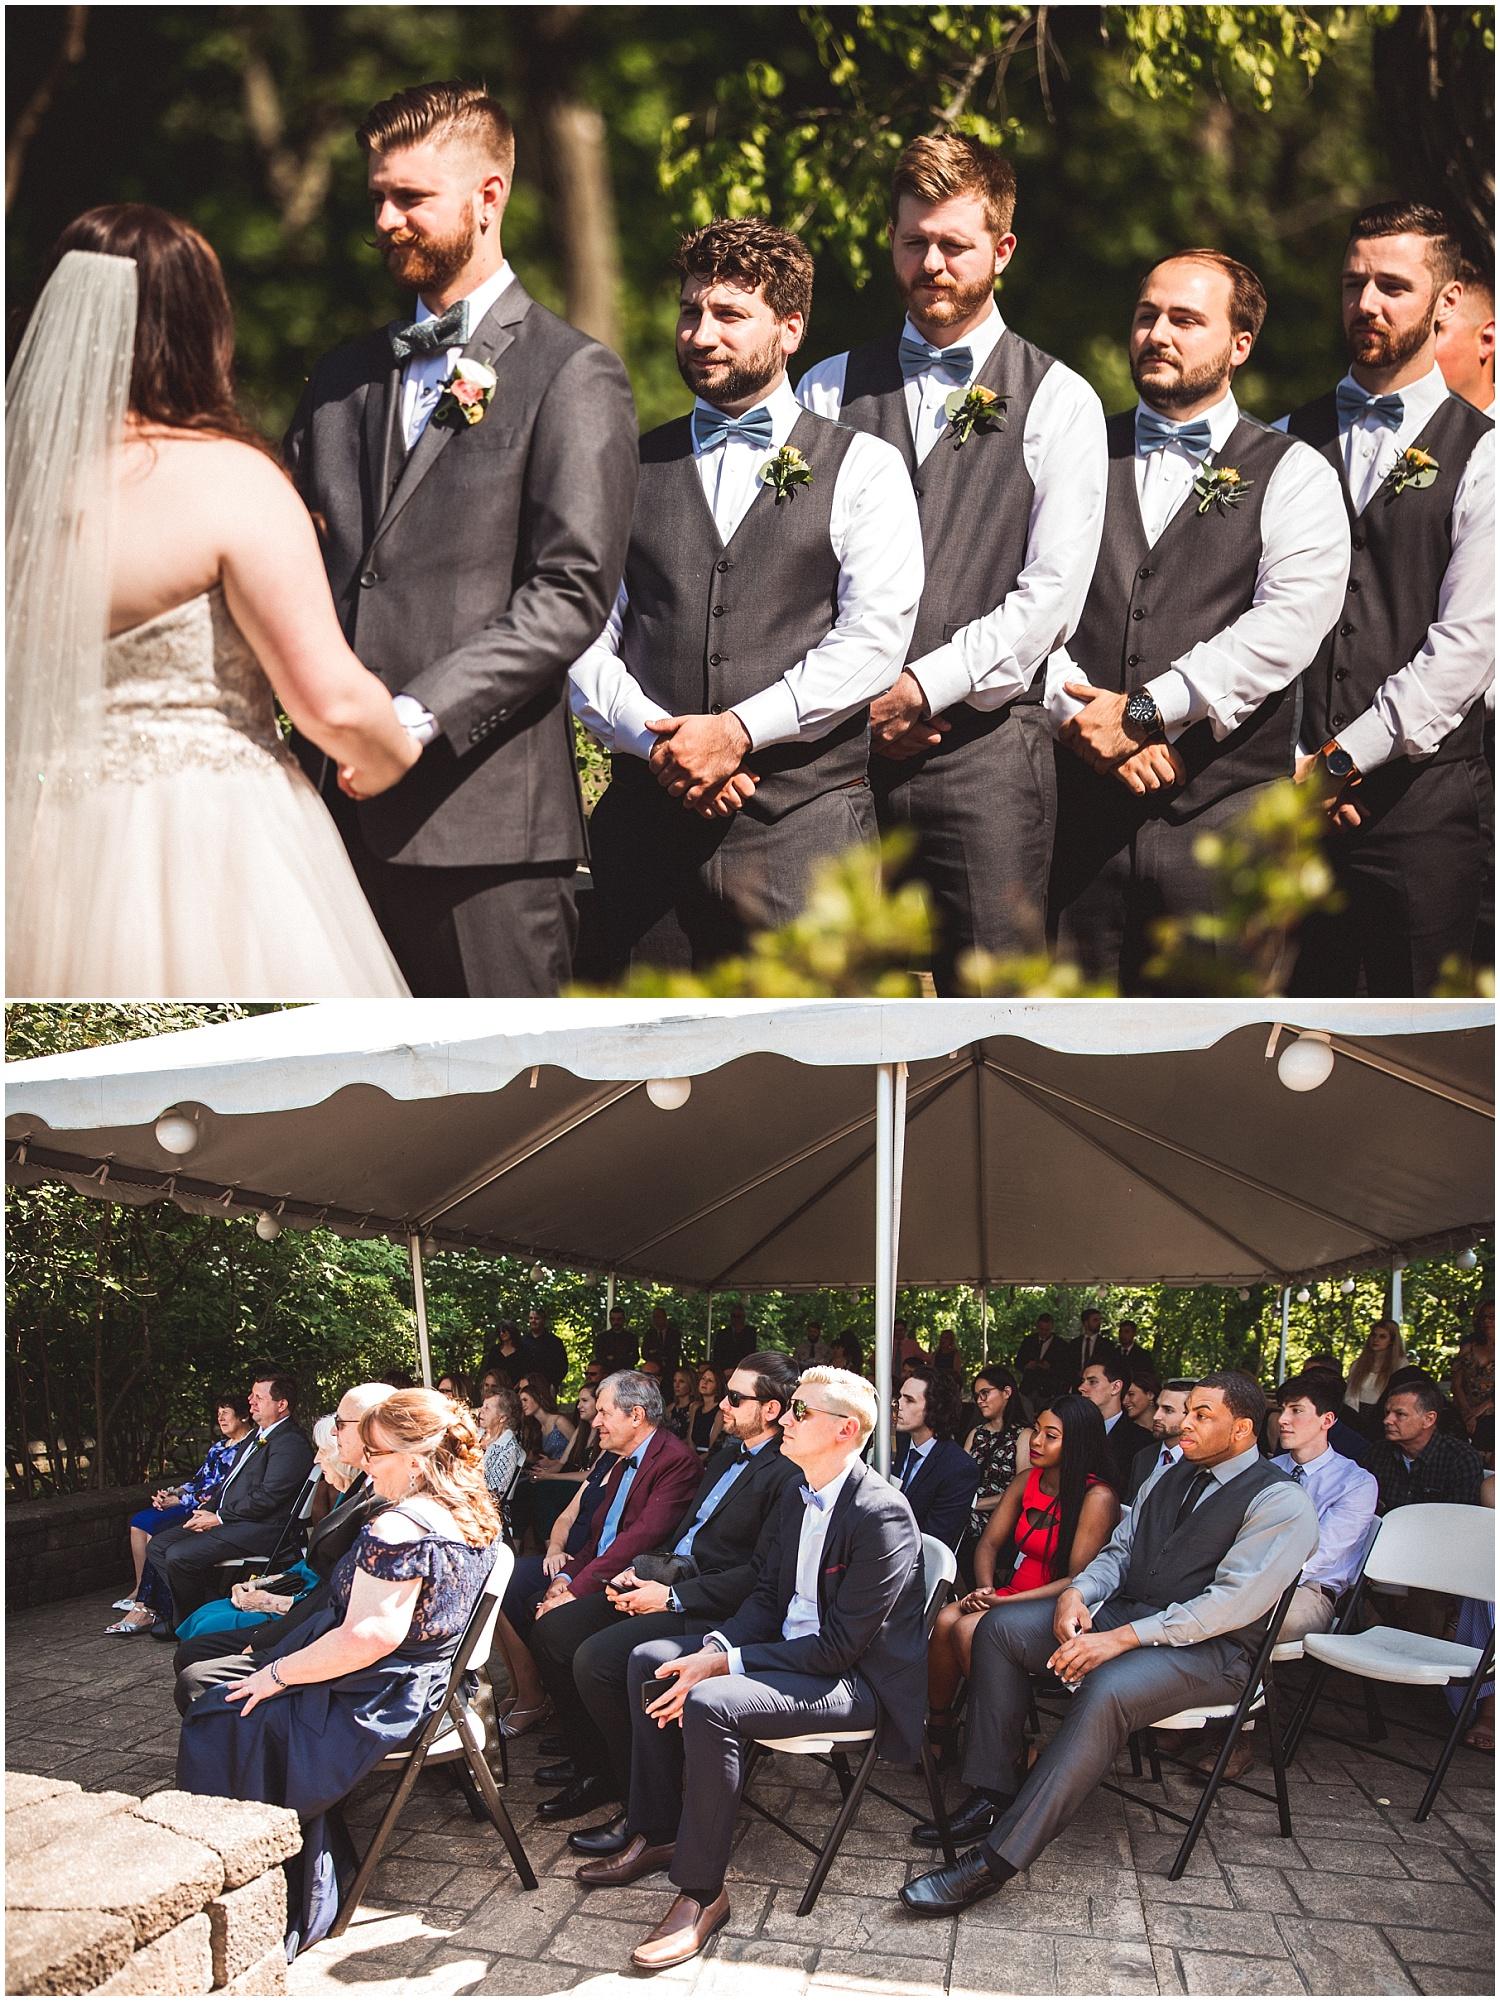 durand+eastman+clubhouse+wedding+megan+antalek (181).jpg